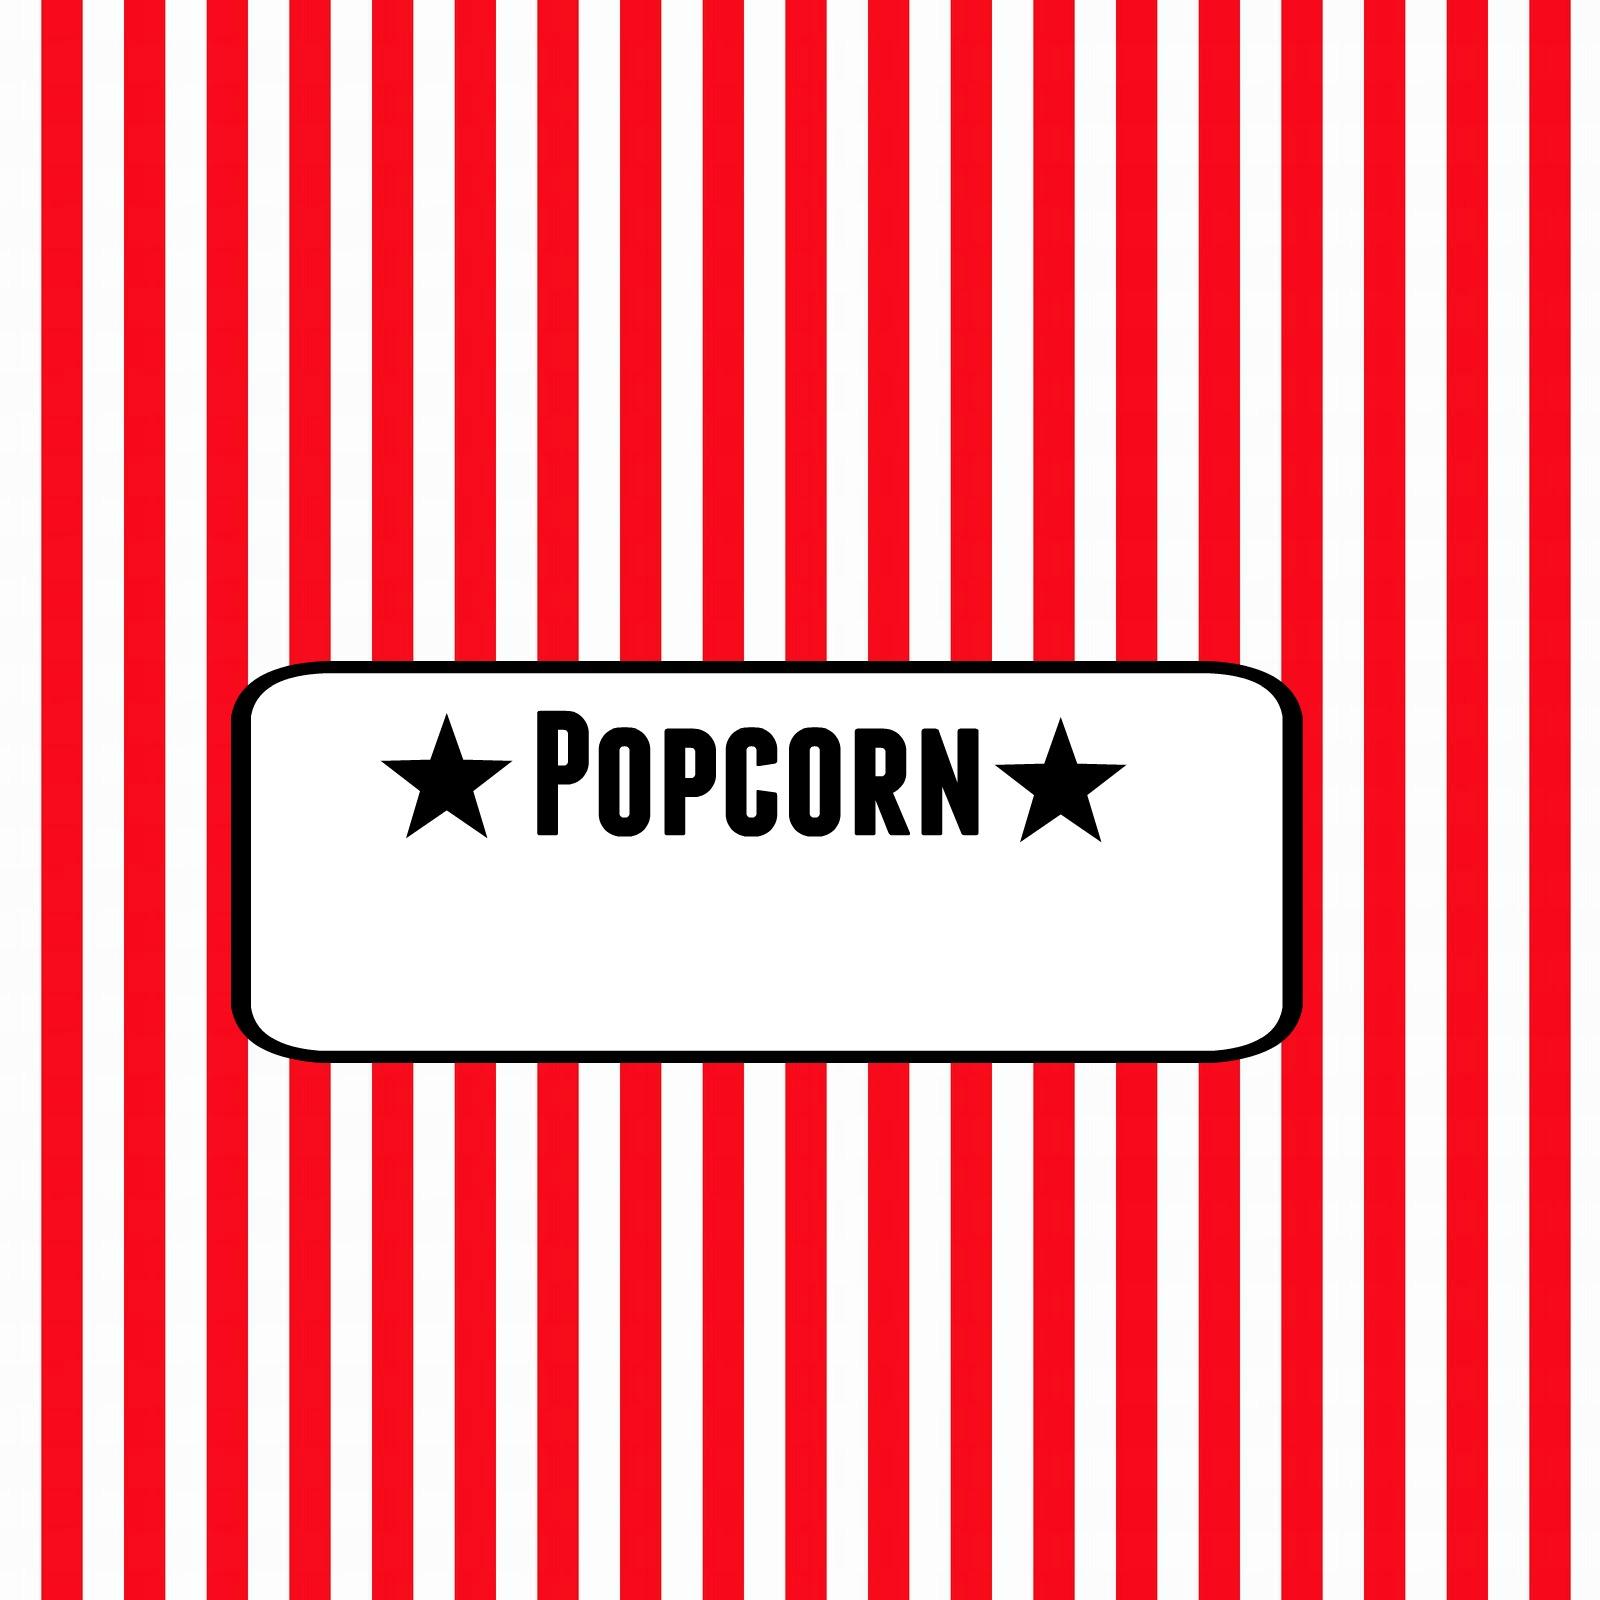 Popcorn Bar Movie Night Kid Birthday Free Printable Download Food Label Red White Stripe